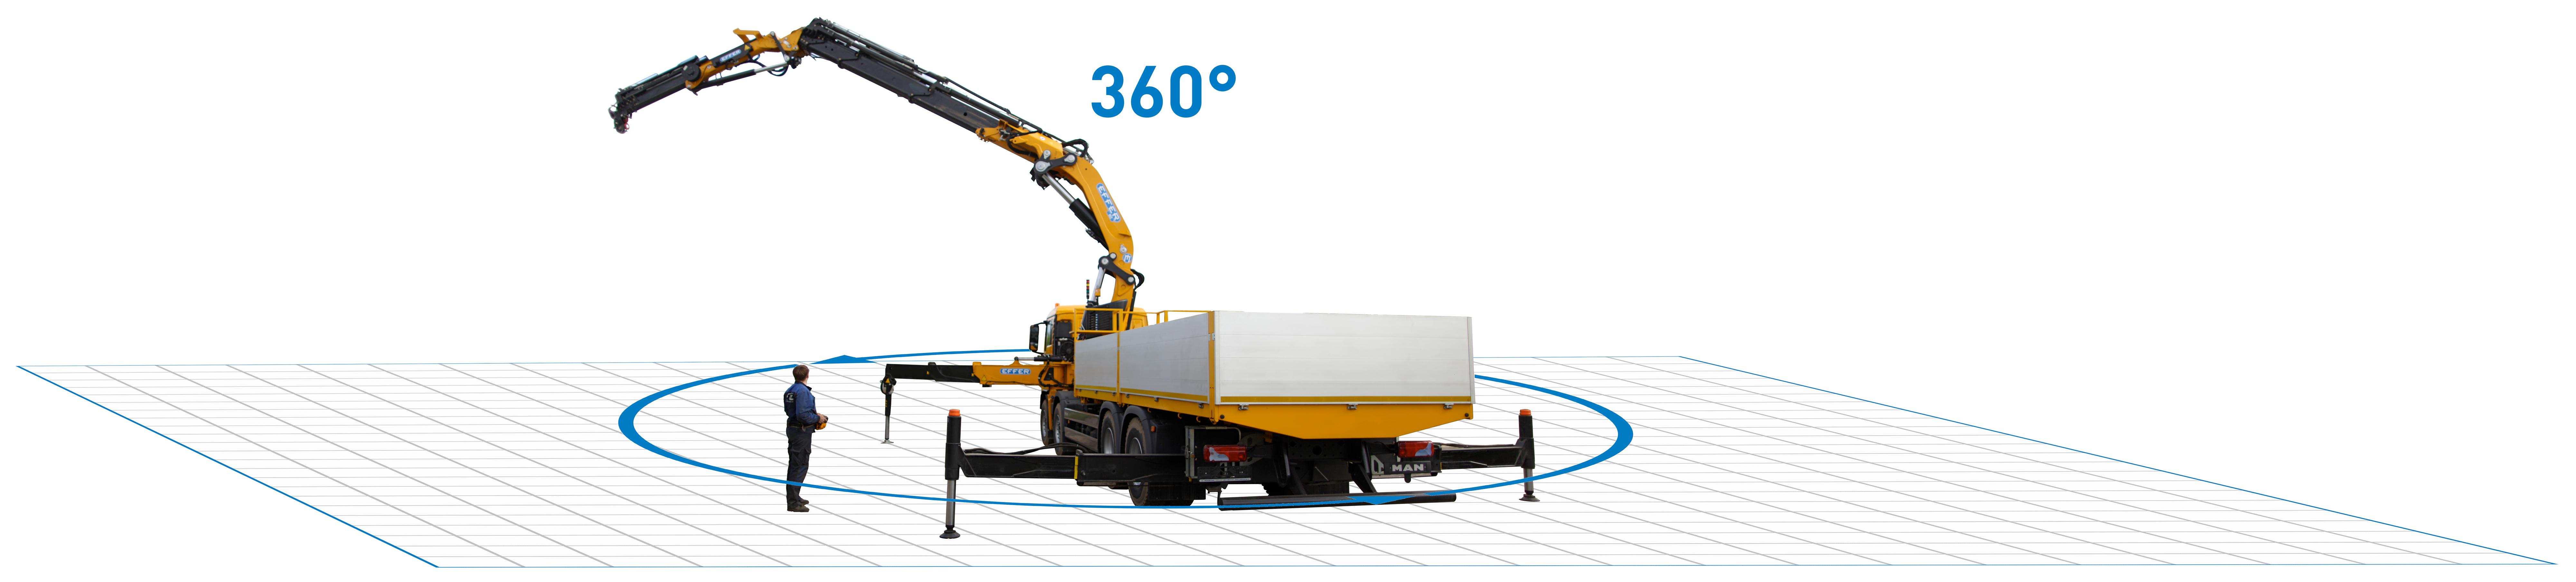 Crane with remote control - Effer Truck Cranes